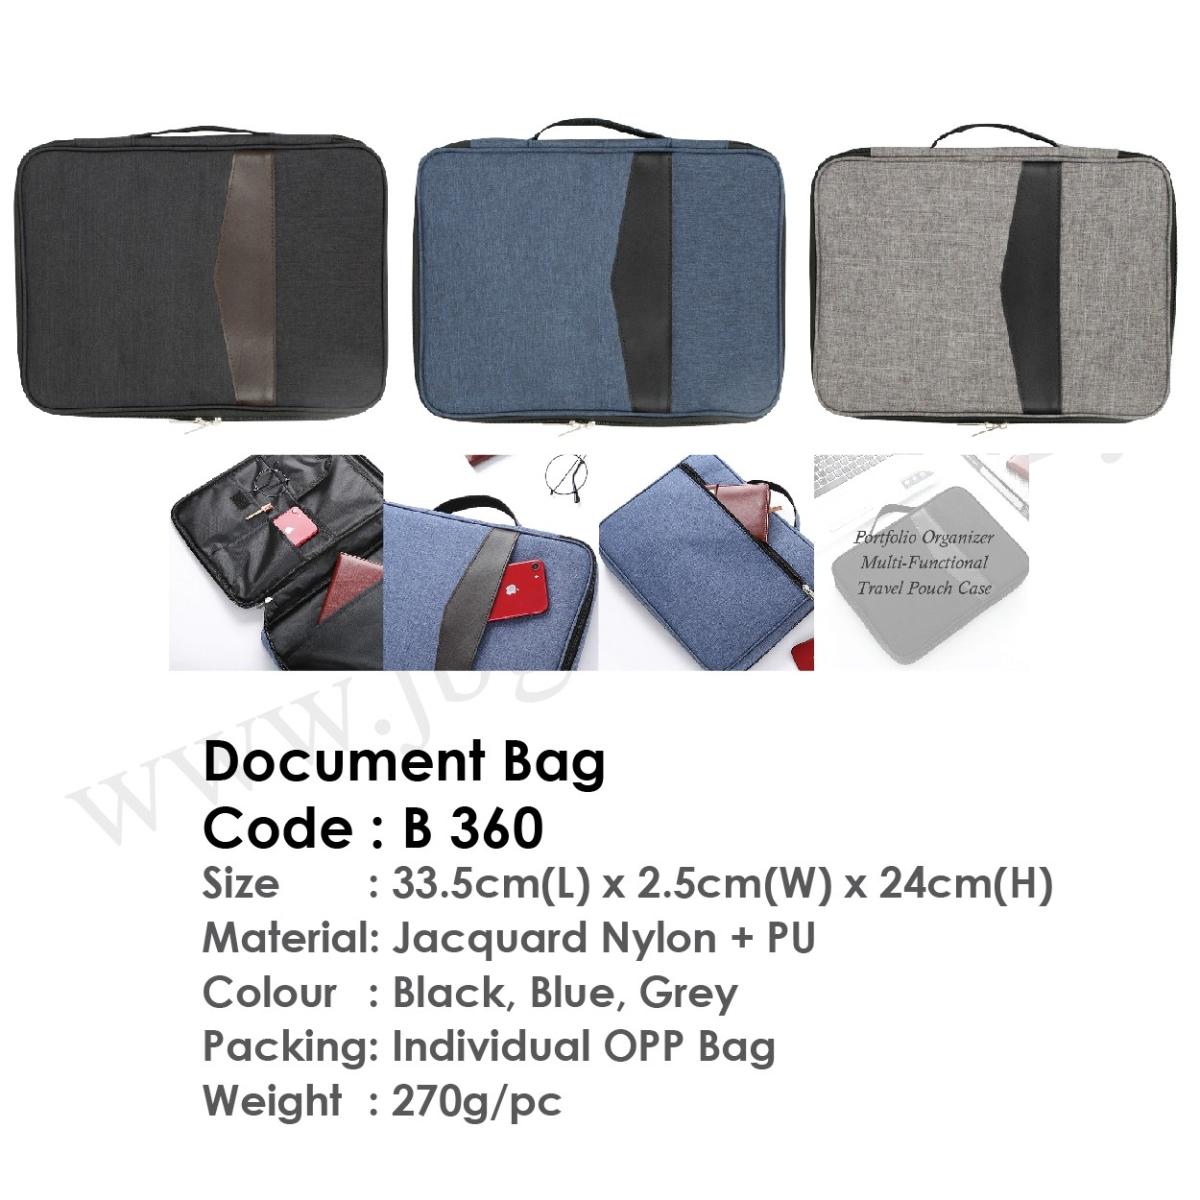 Document Bag B360 Document Bag Bag Johor Bahru (JB), Malaysia Supplier, Suppliers, Supply, Supplies | JB GIFT & SOUVENIR (M) SDN BHD